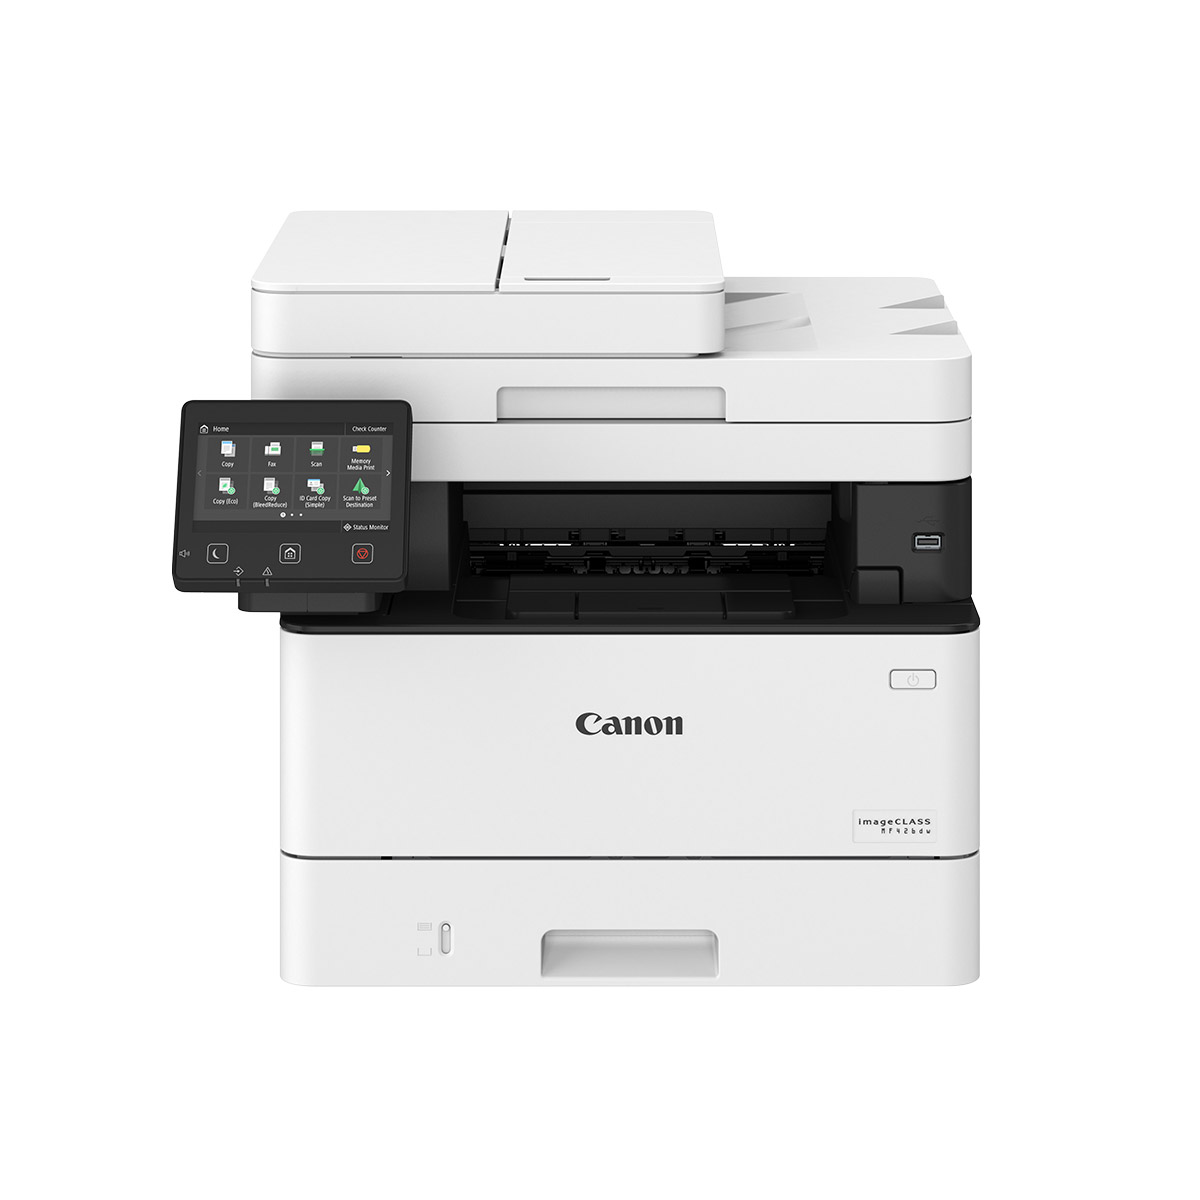 laser printer imageCLASS MF426dw